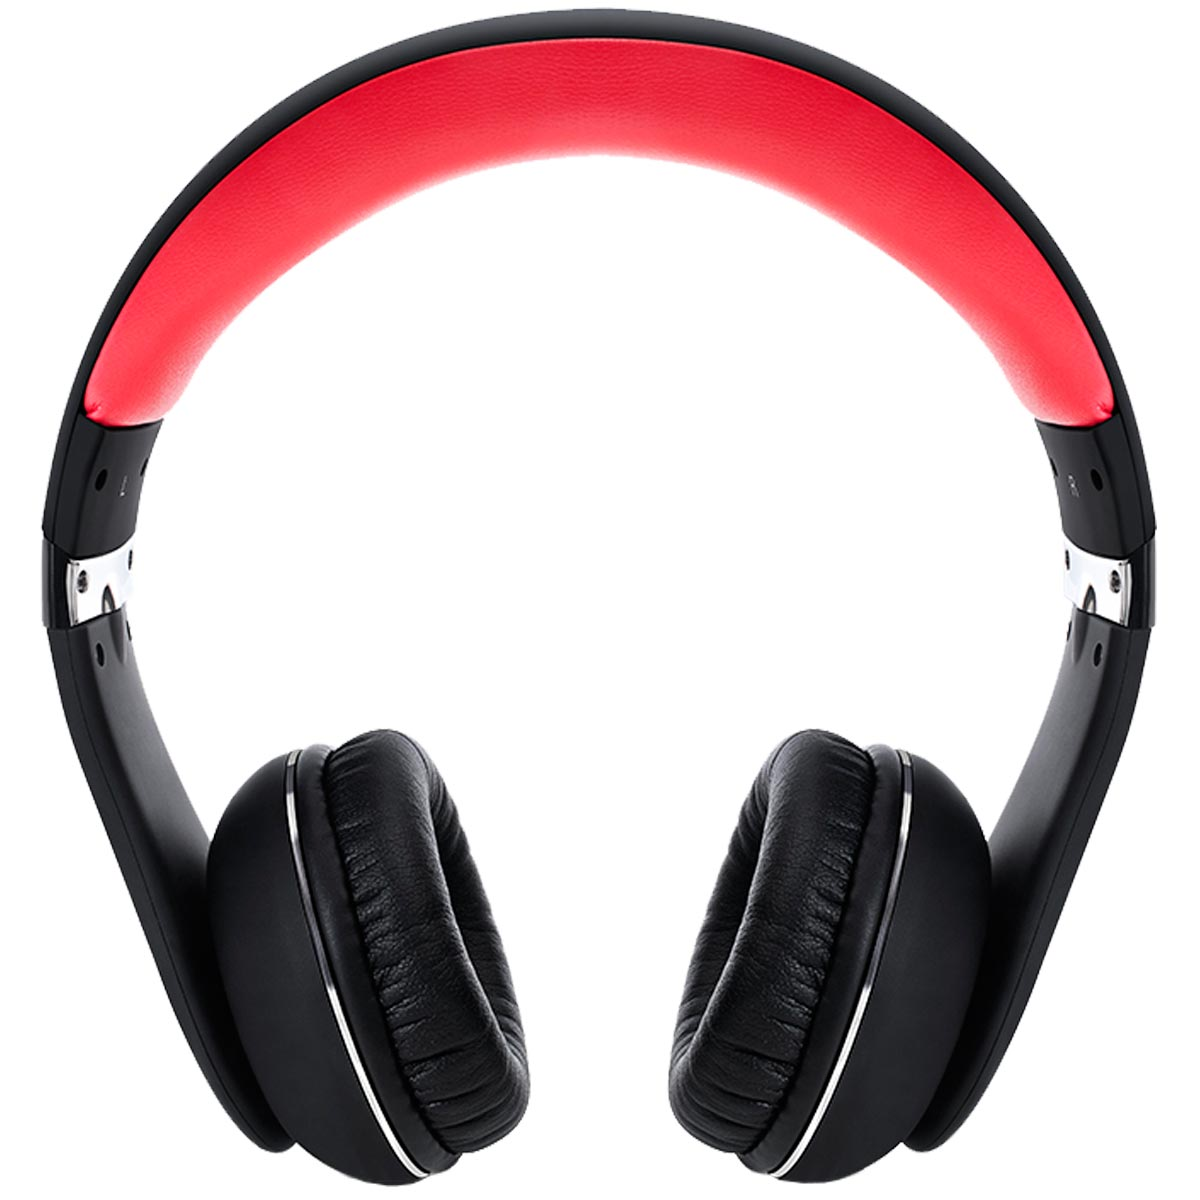 Fone de Ouvido On-ear 20 Hz - 20 KHz 32 Ohms - HF 325 Numark